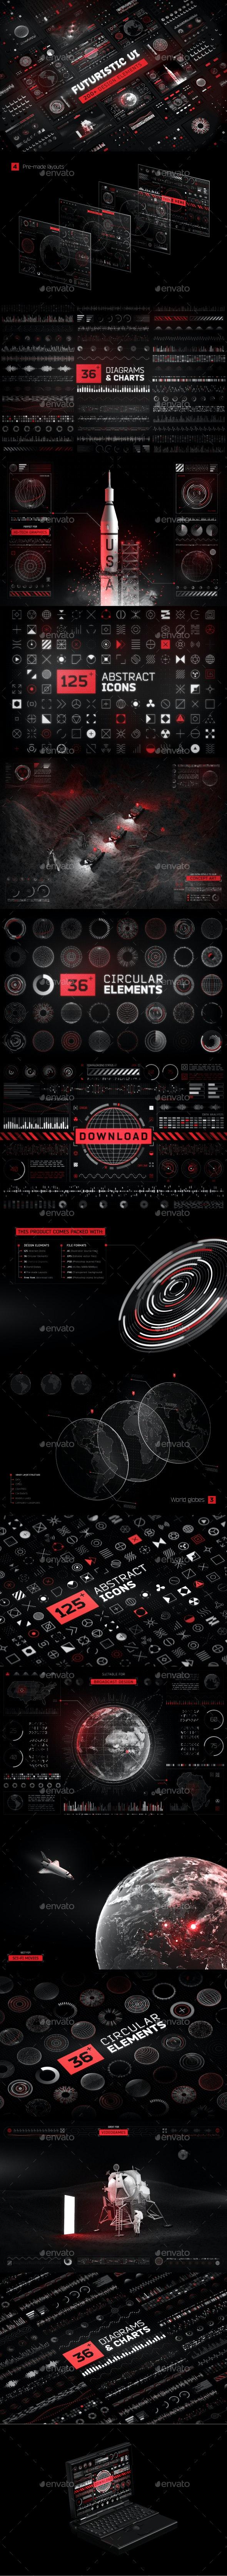 Futuristic UI Kit • 200 design elements - Miscellaneous Product Mock-Ups